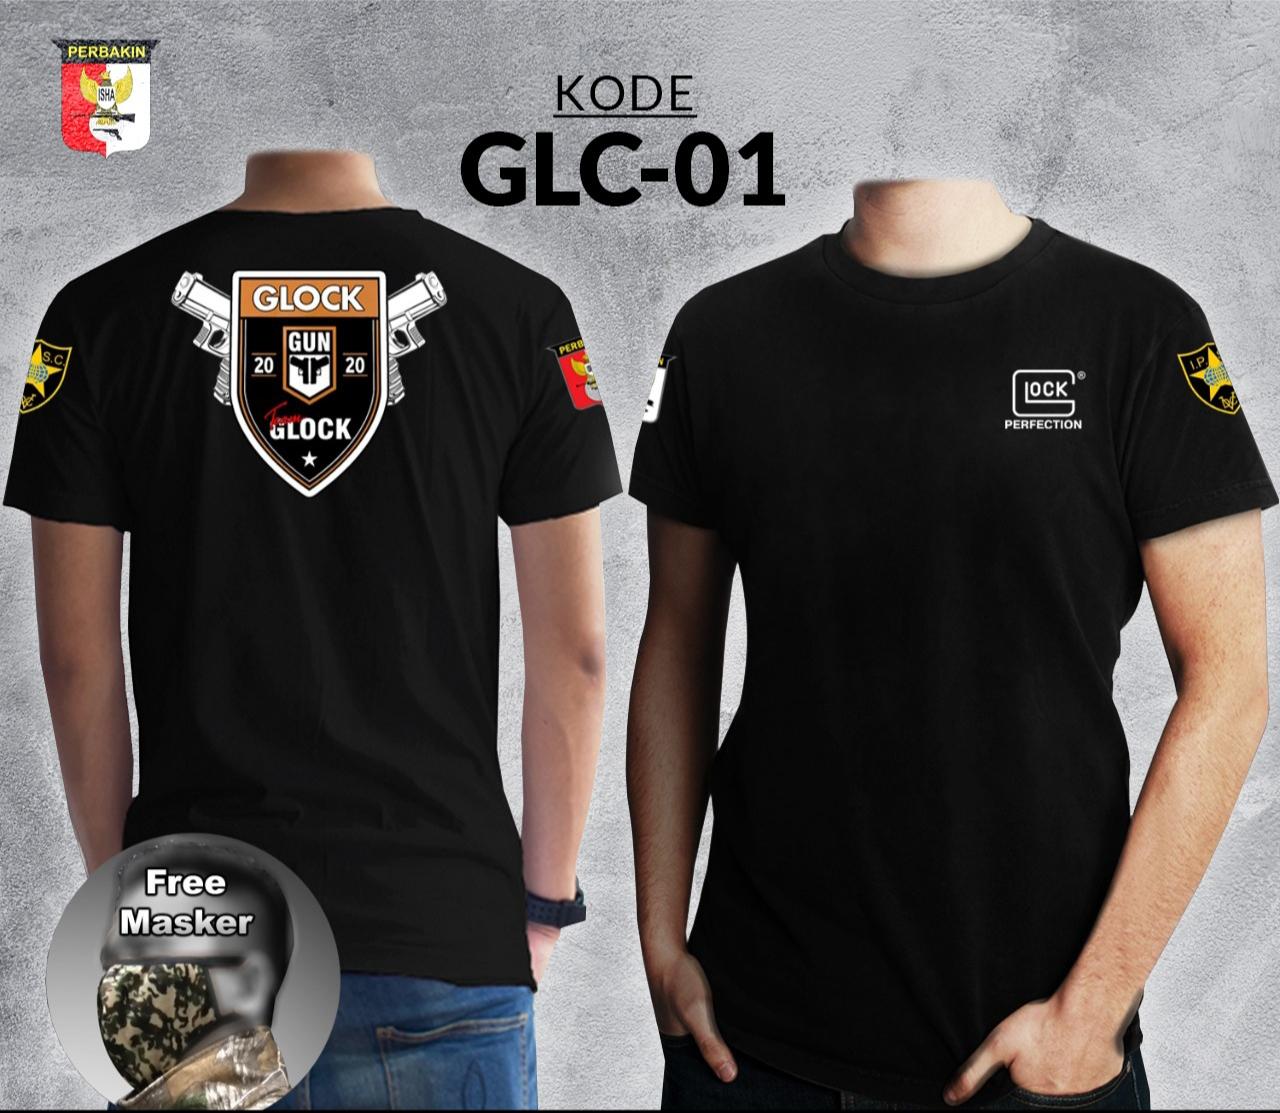 Perbakin GLC-01